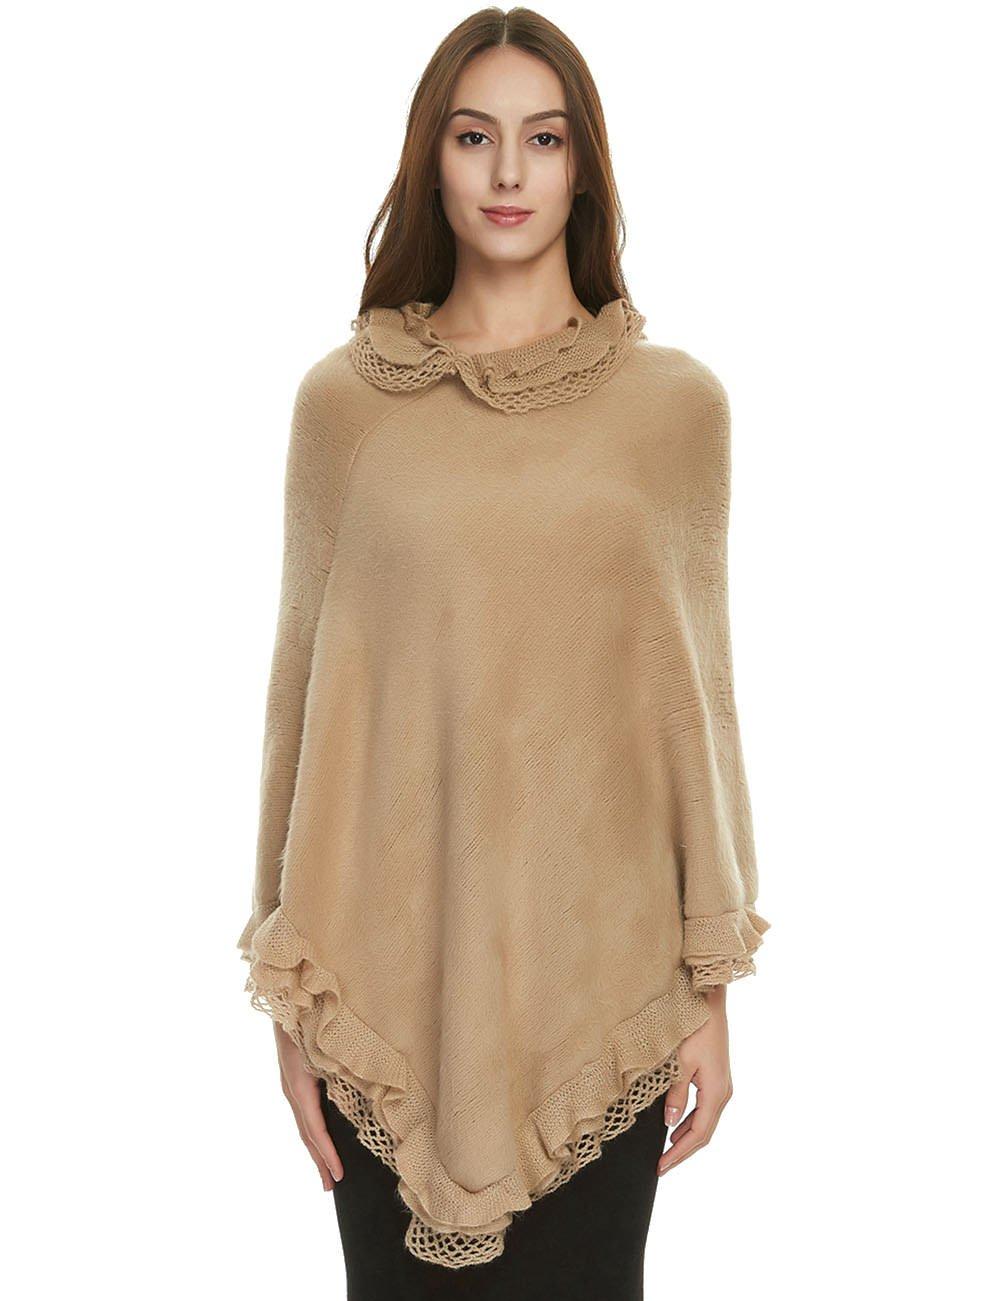 Ferand Women's Ruffle Lace Soft Poncho Sweater Warm Pullover Cape, Khaki